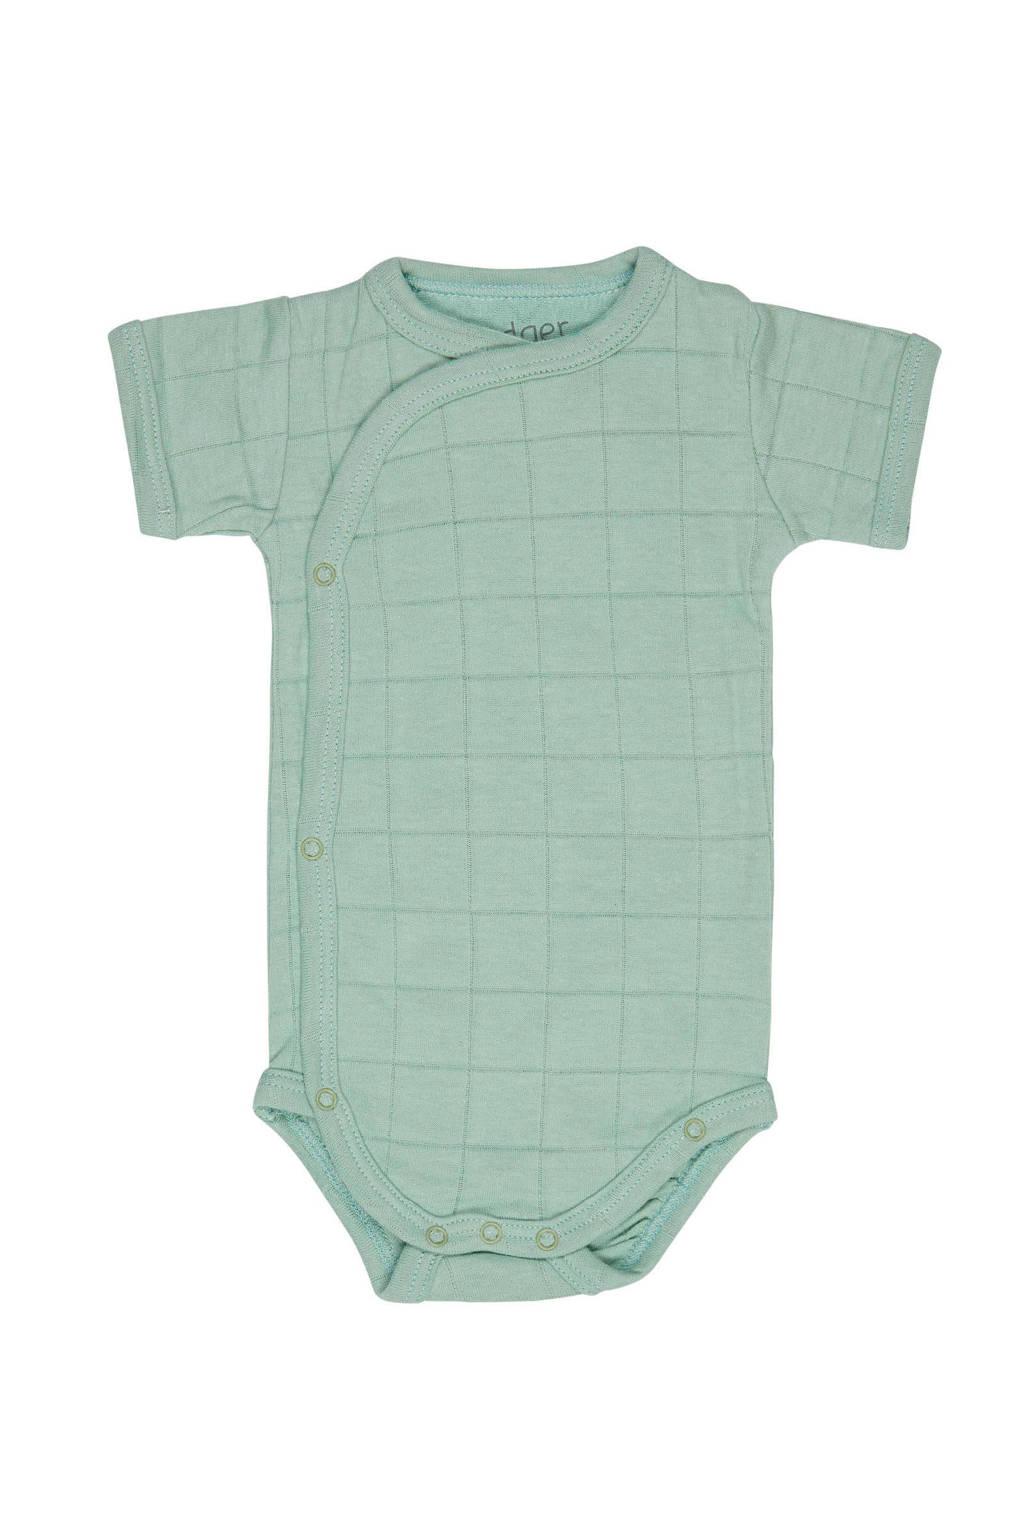 Lodger newborn baby romper Ciumbelle, Mintgroen